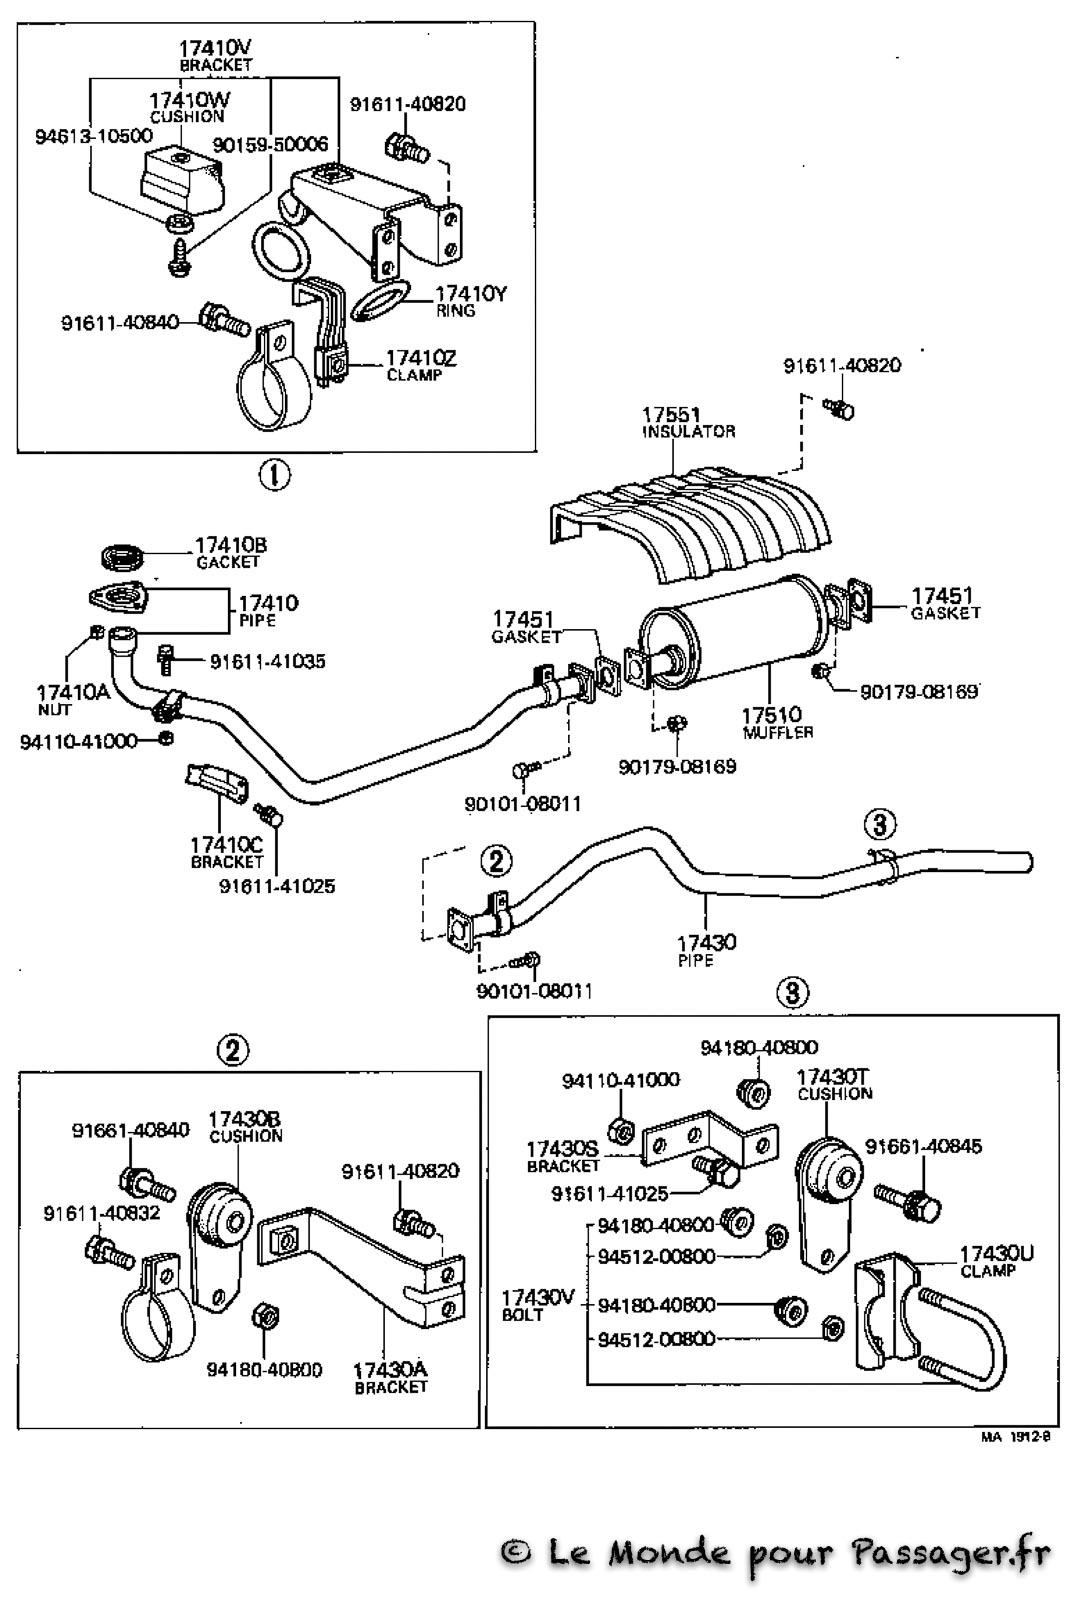 Fj55-Eclatés-Techniques162